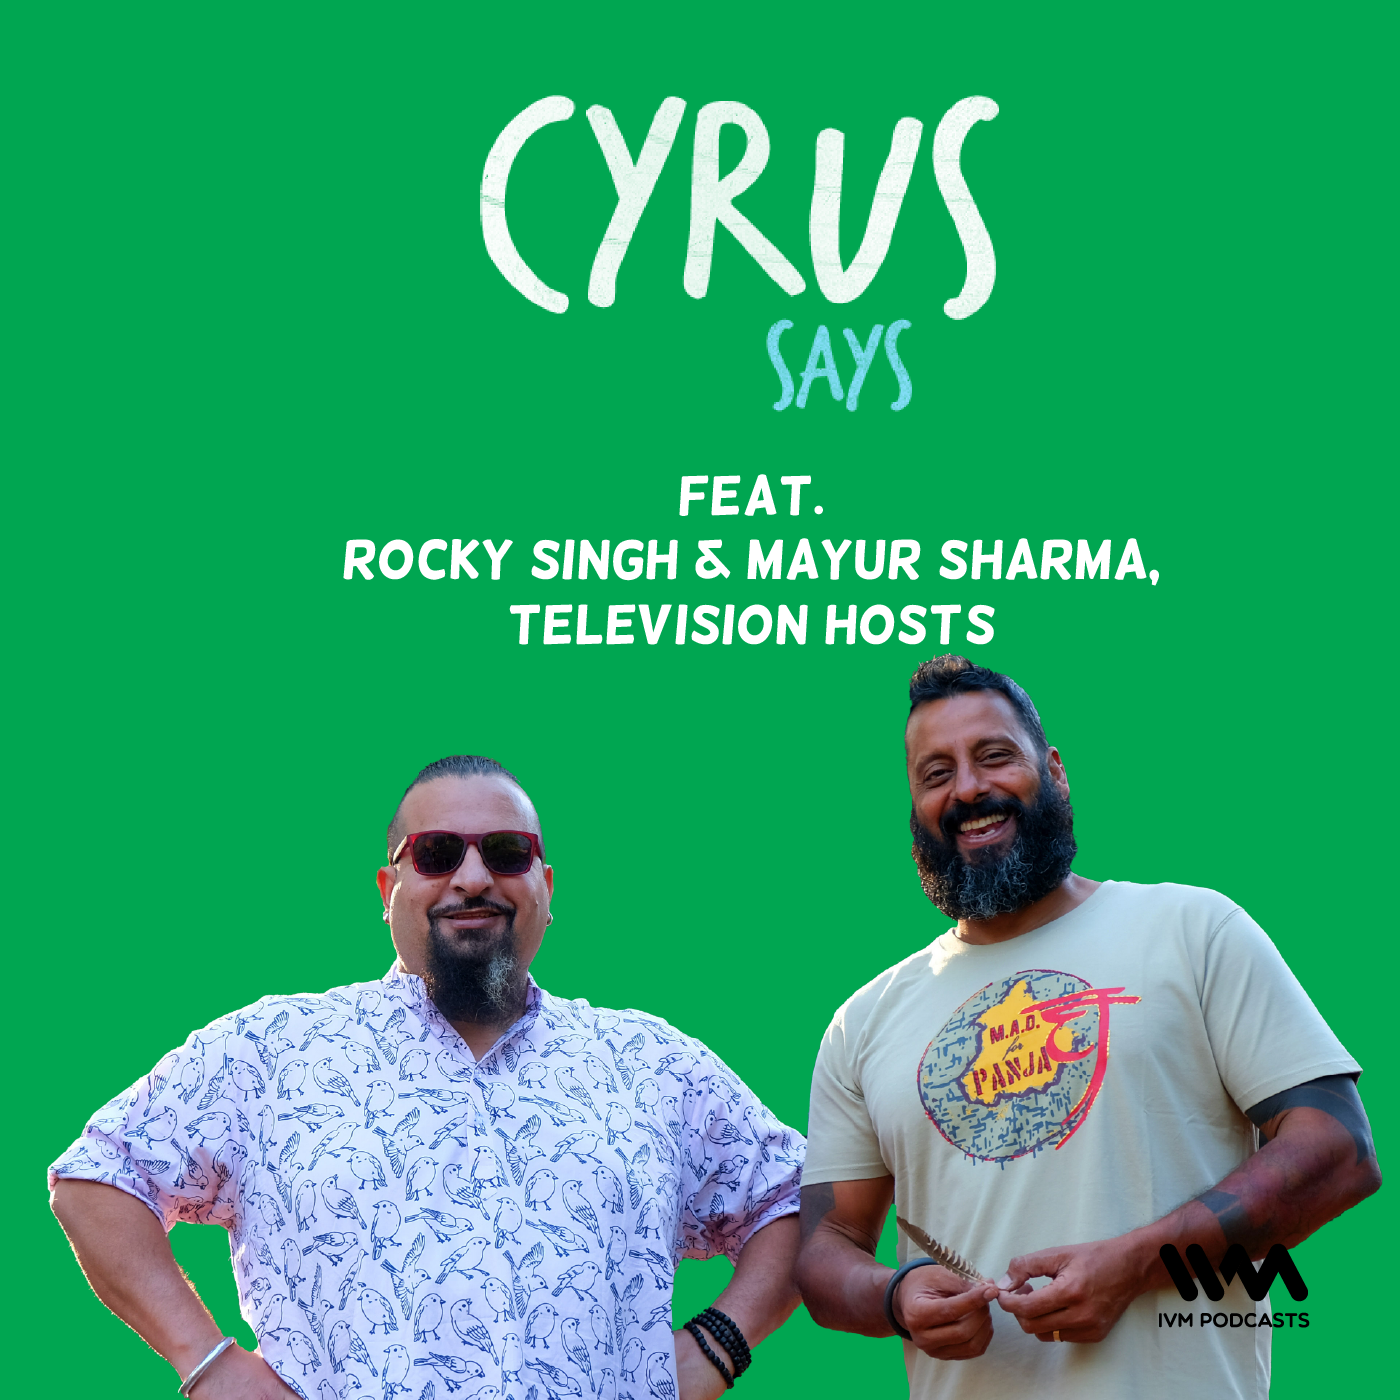 Ep. 630: feat. Rocky & Mayur